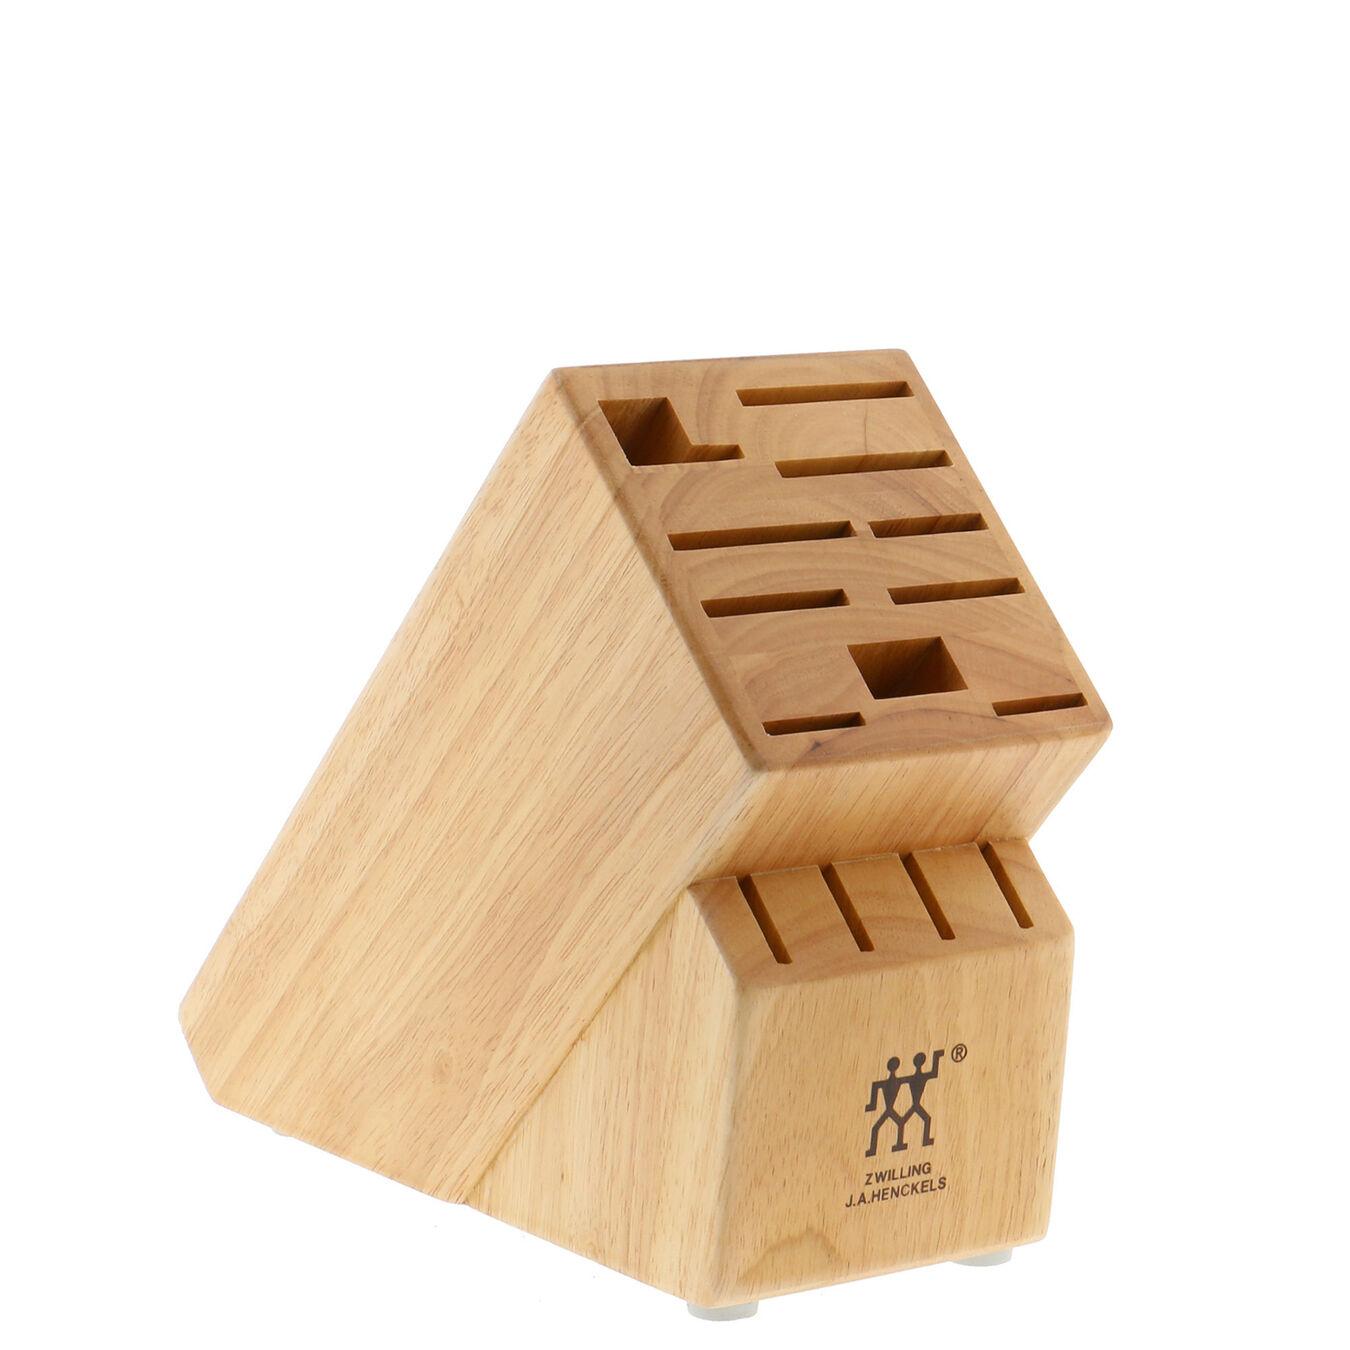 10-pc Knife Block Set,,large 12